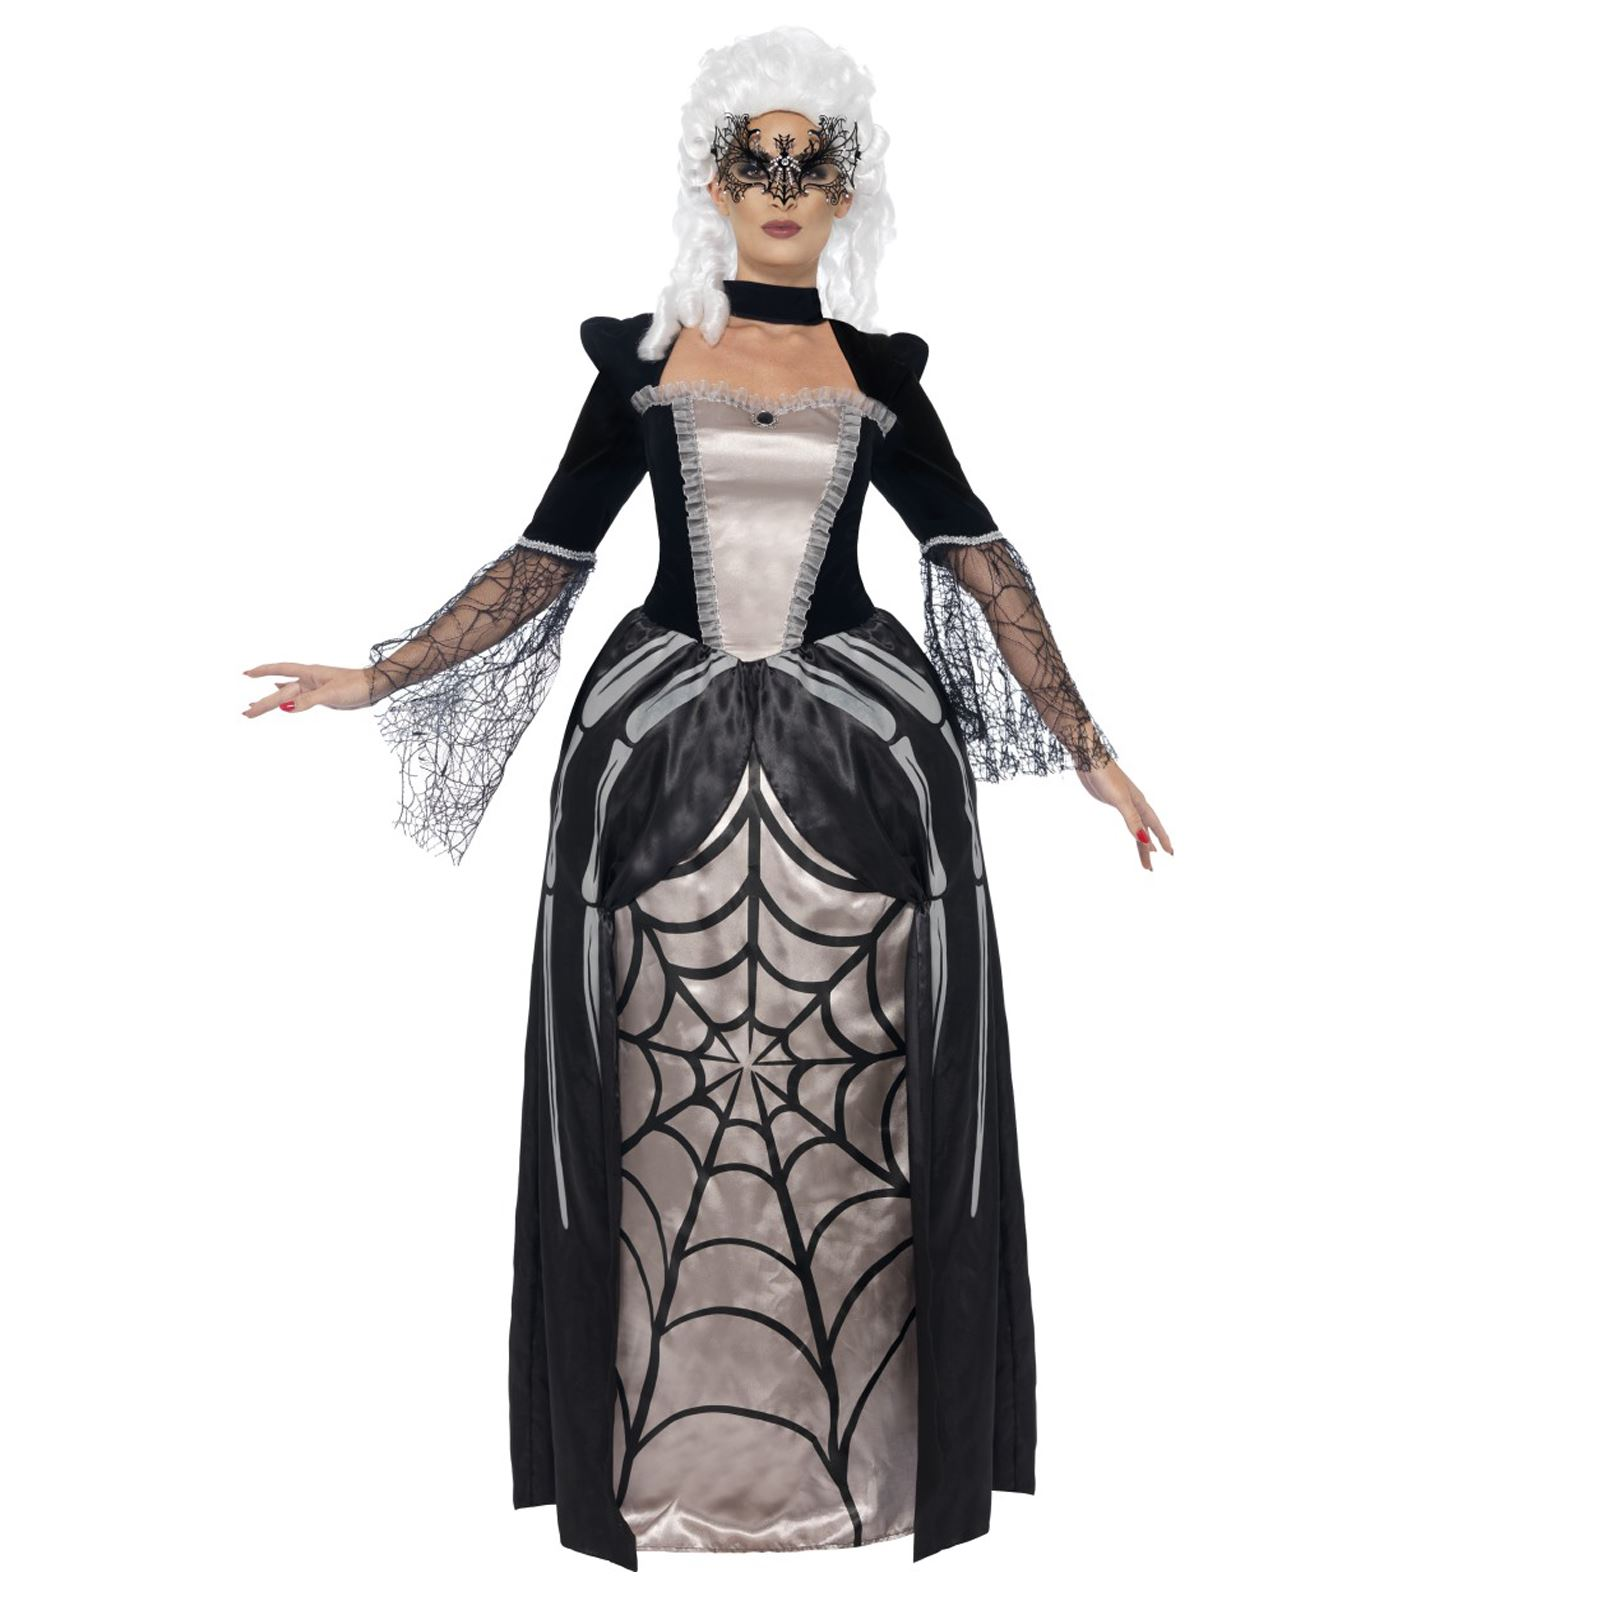 Ladies Black Widow Spider Baroness Costume Gothic Masquerade Ball ...